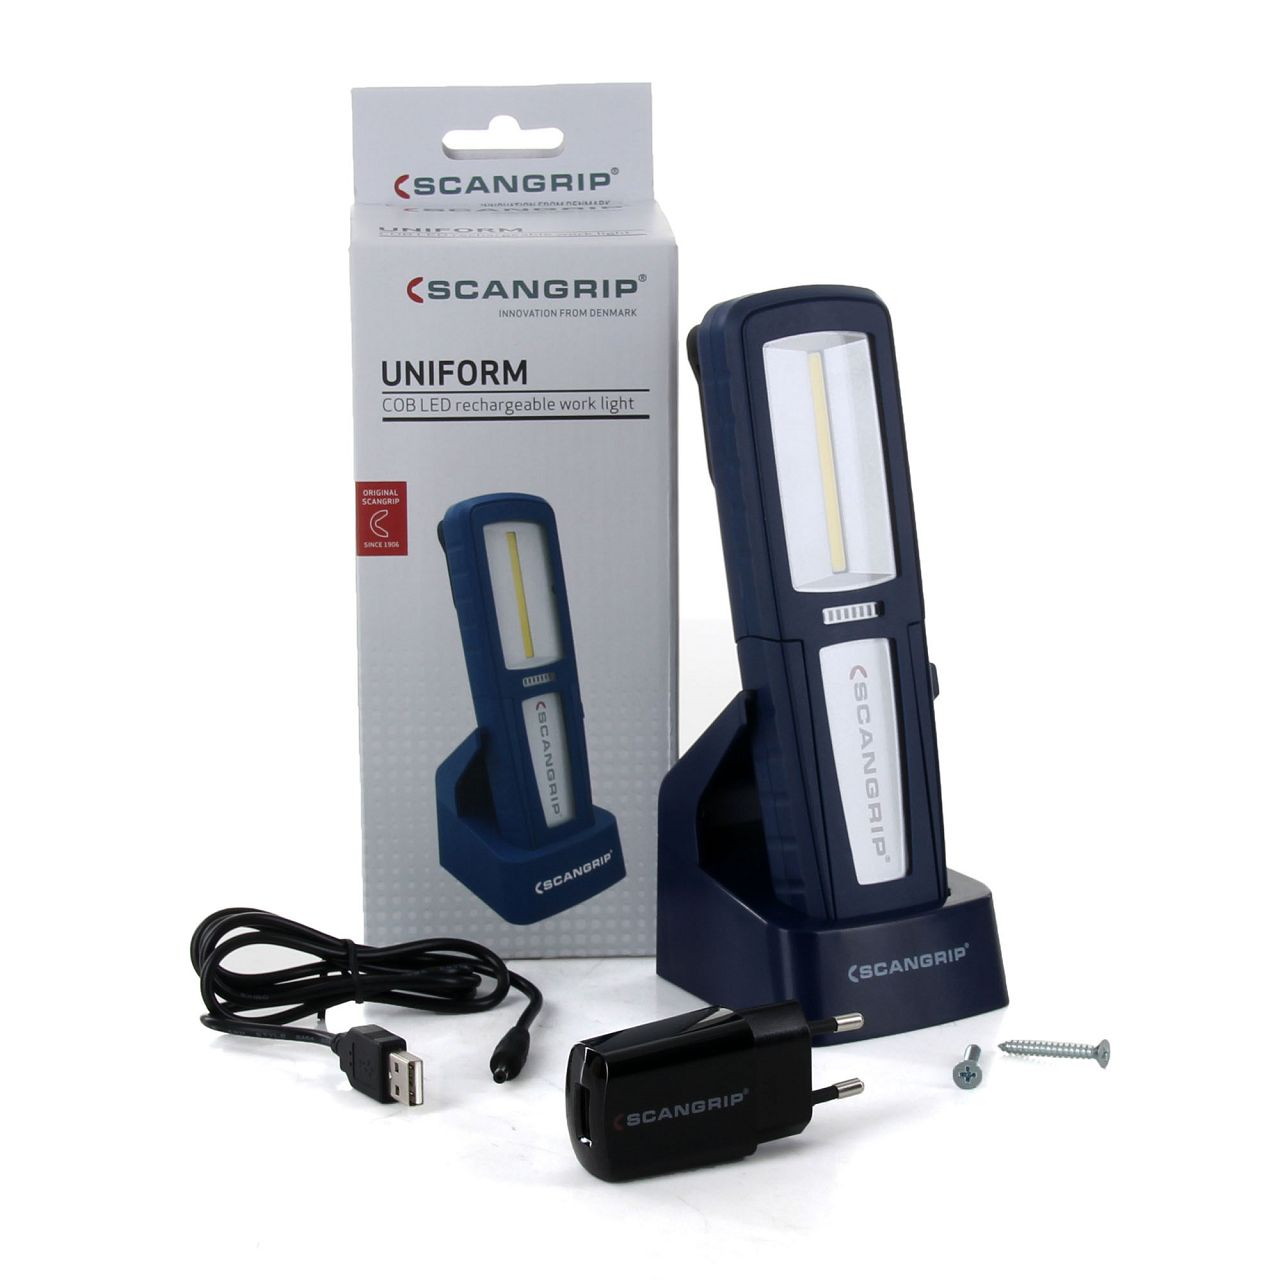 SCANGRIP 03.5407 UNIFORM LED Werkstattlampe Arbeitslampe Handlampe Taschenlampe